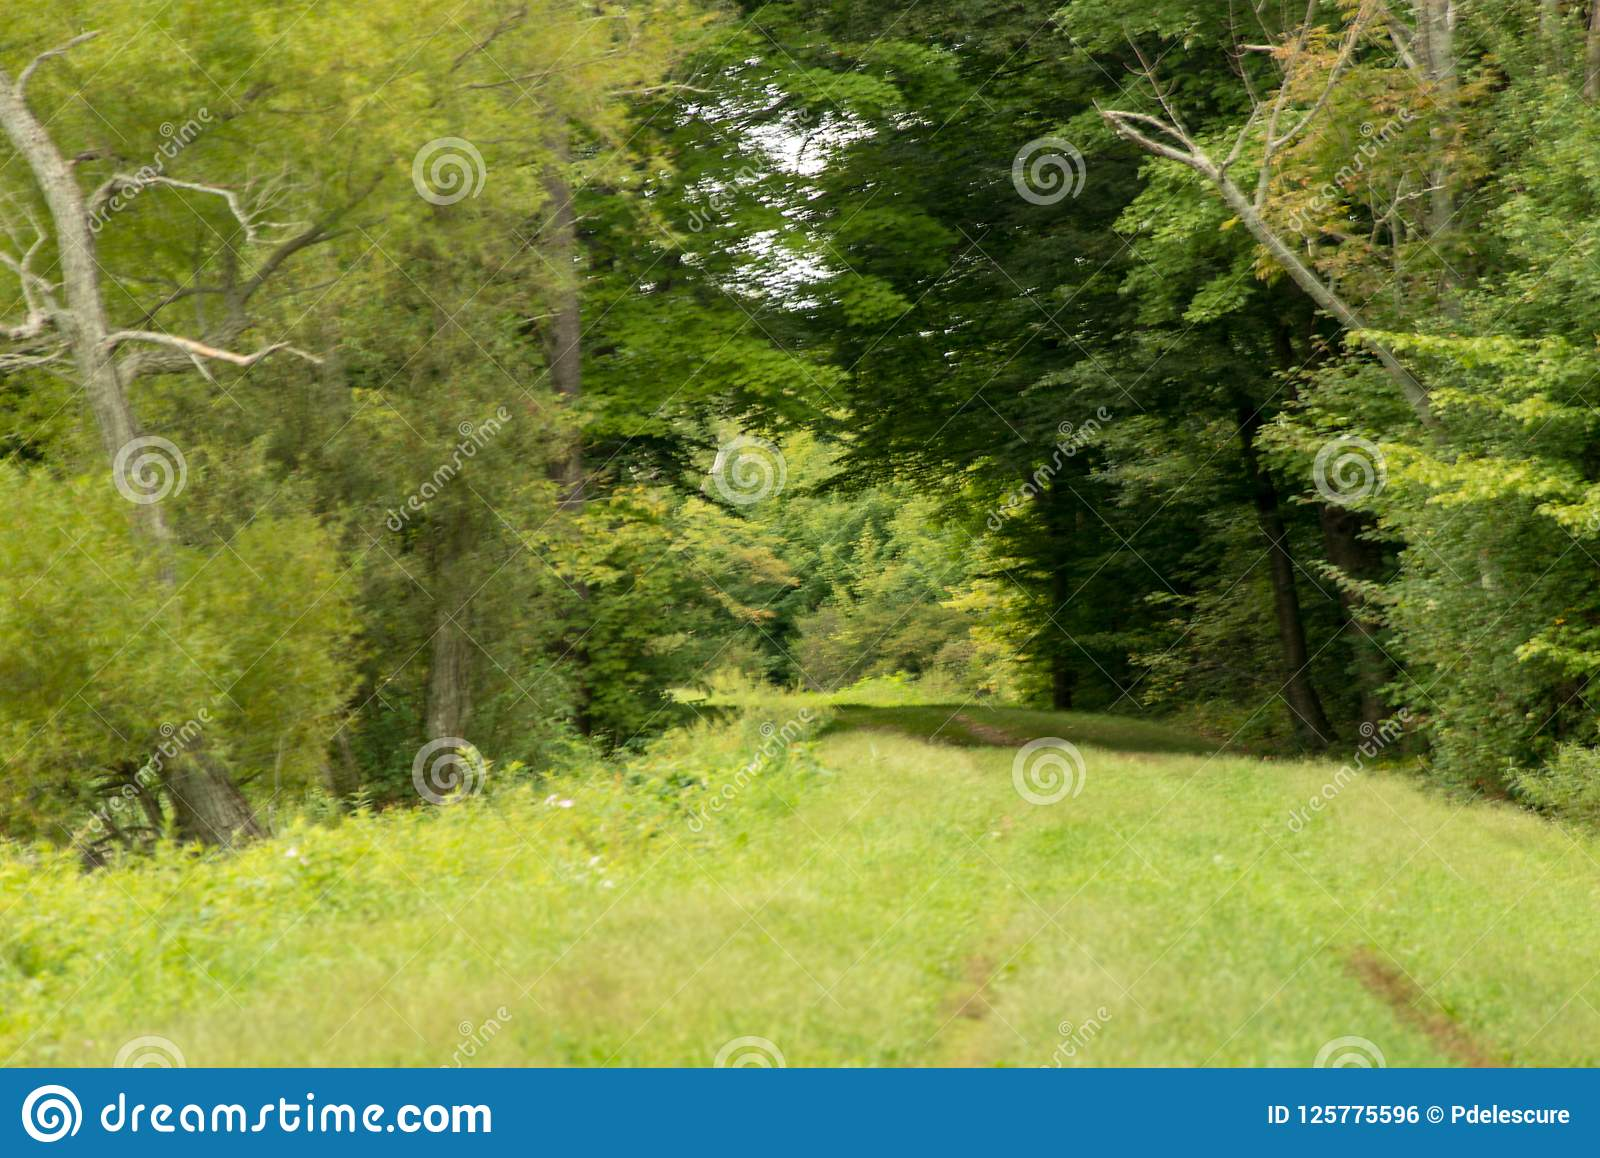 Bana i skogen nära den Howard Eaton behållaren